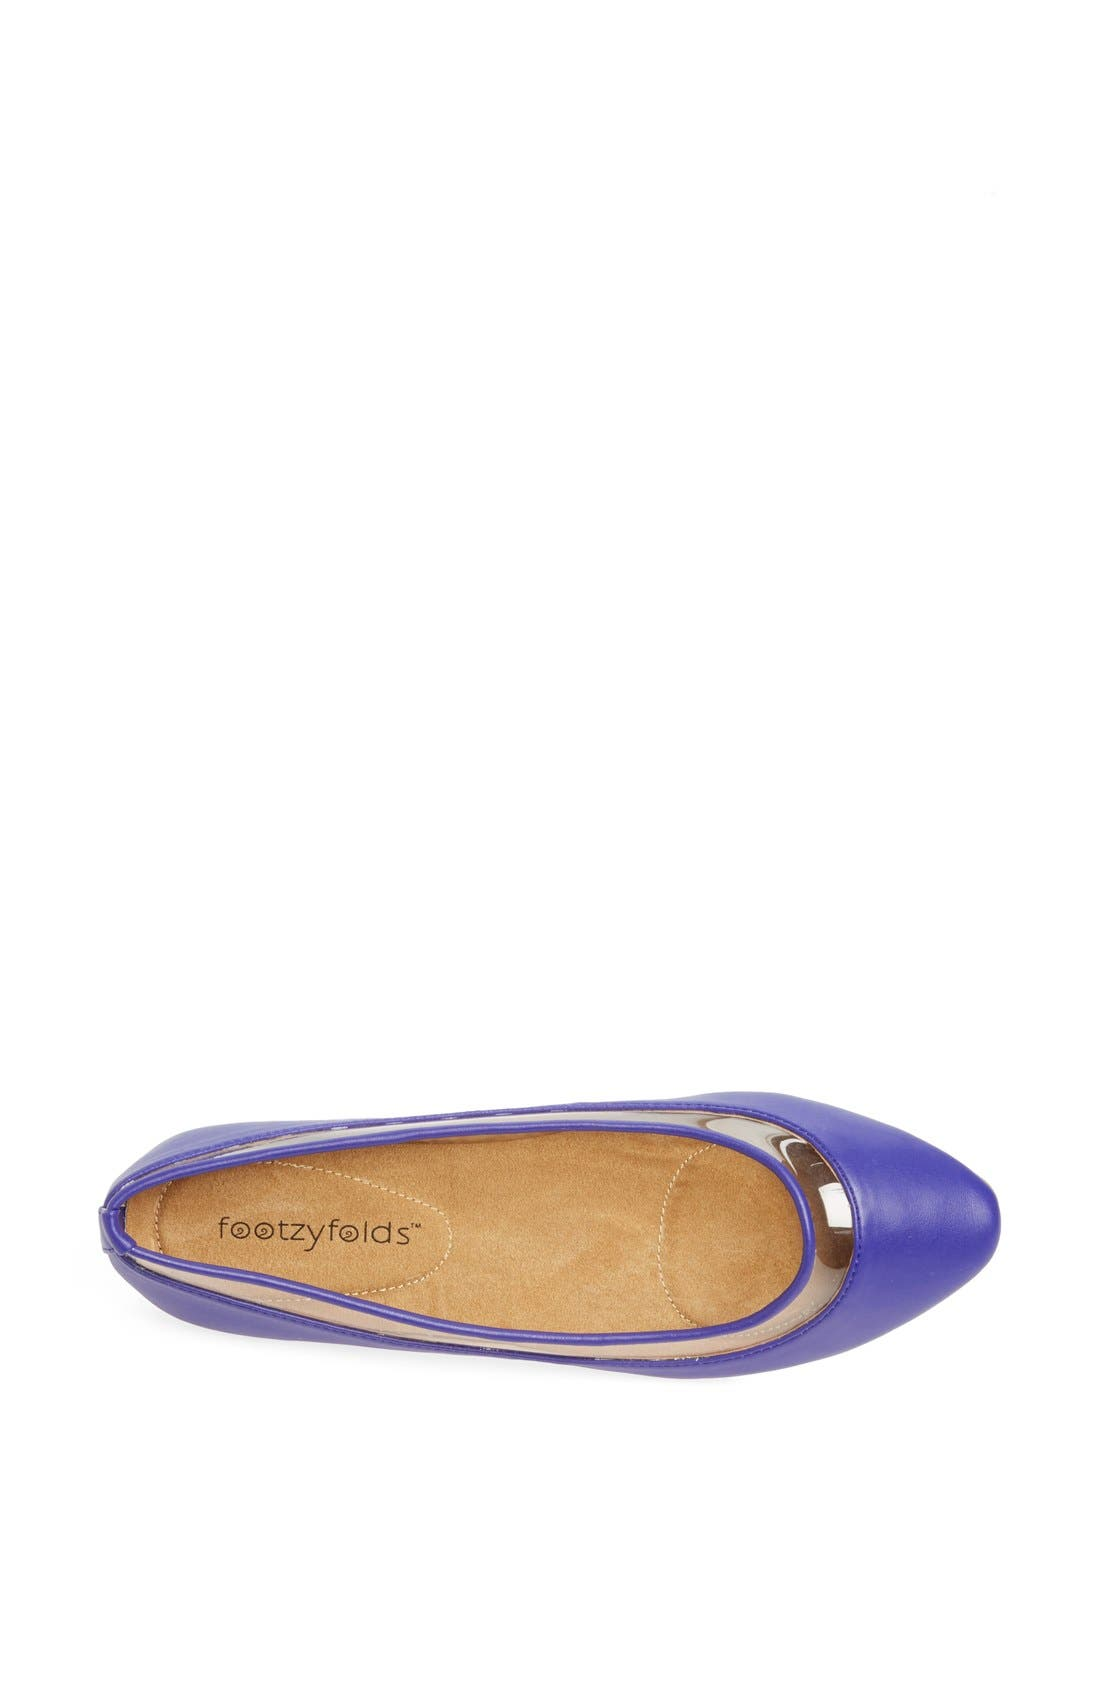 Alternate Image 3  - Footzyfolds 'Penelope' Flat